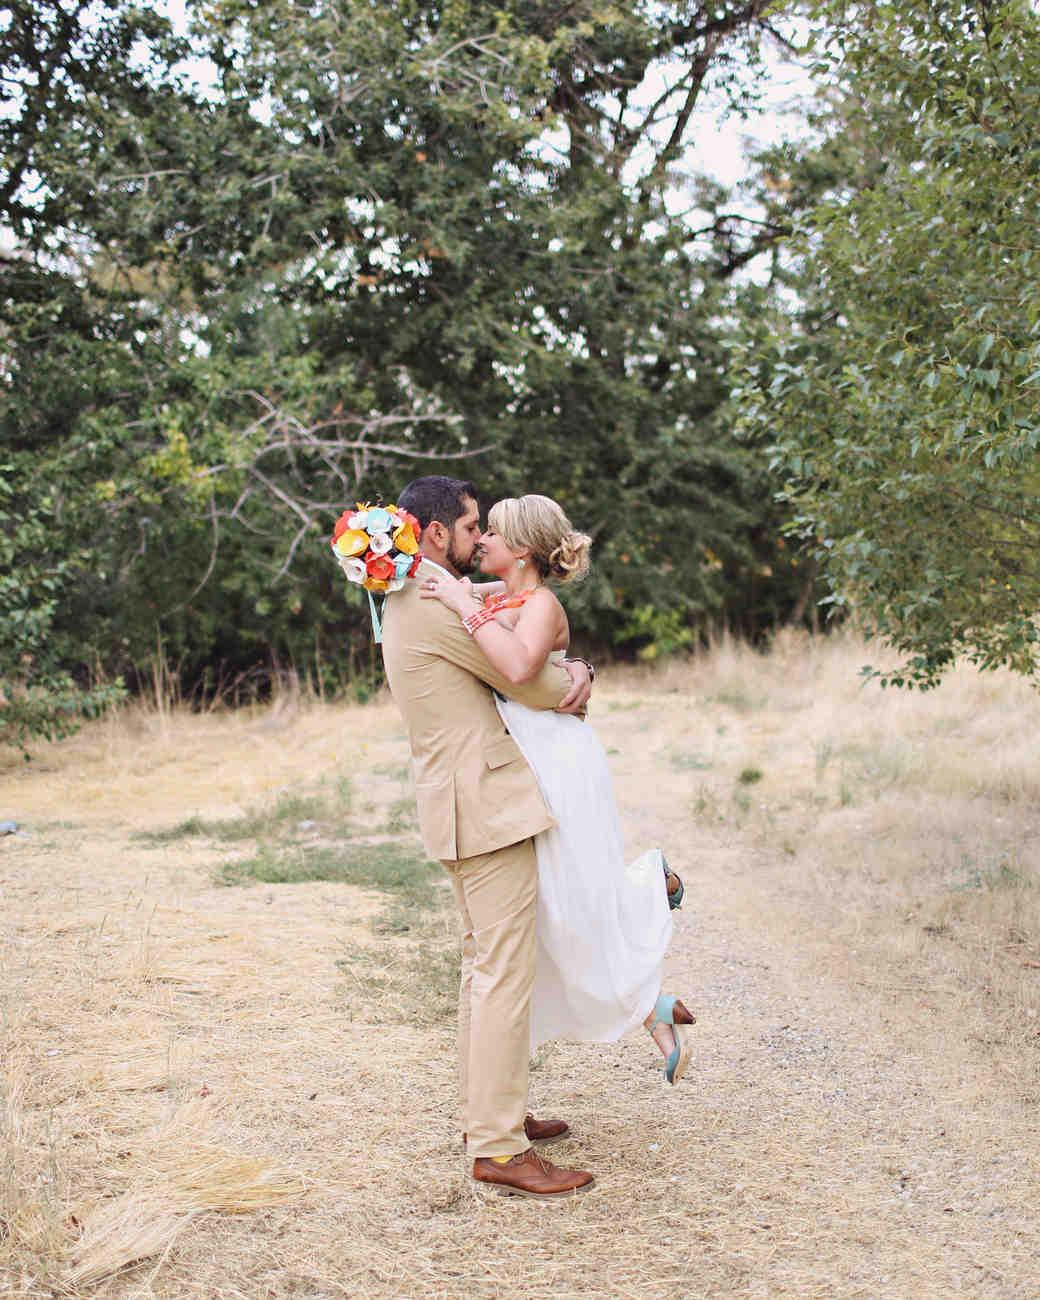 real-weddings-nichole-matthew-wd0413-166.jpg